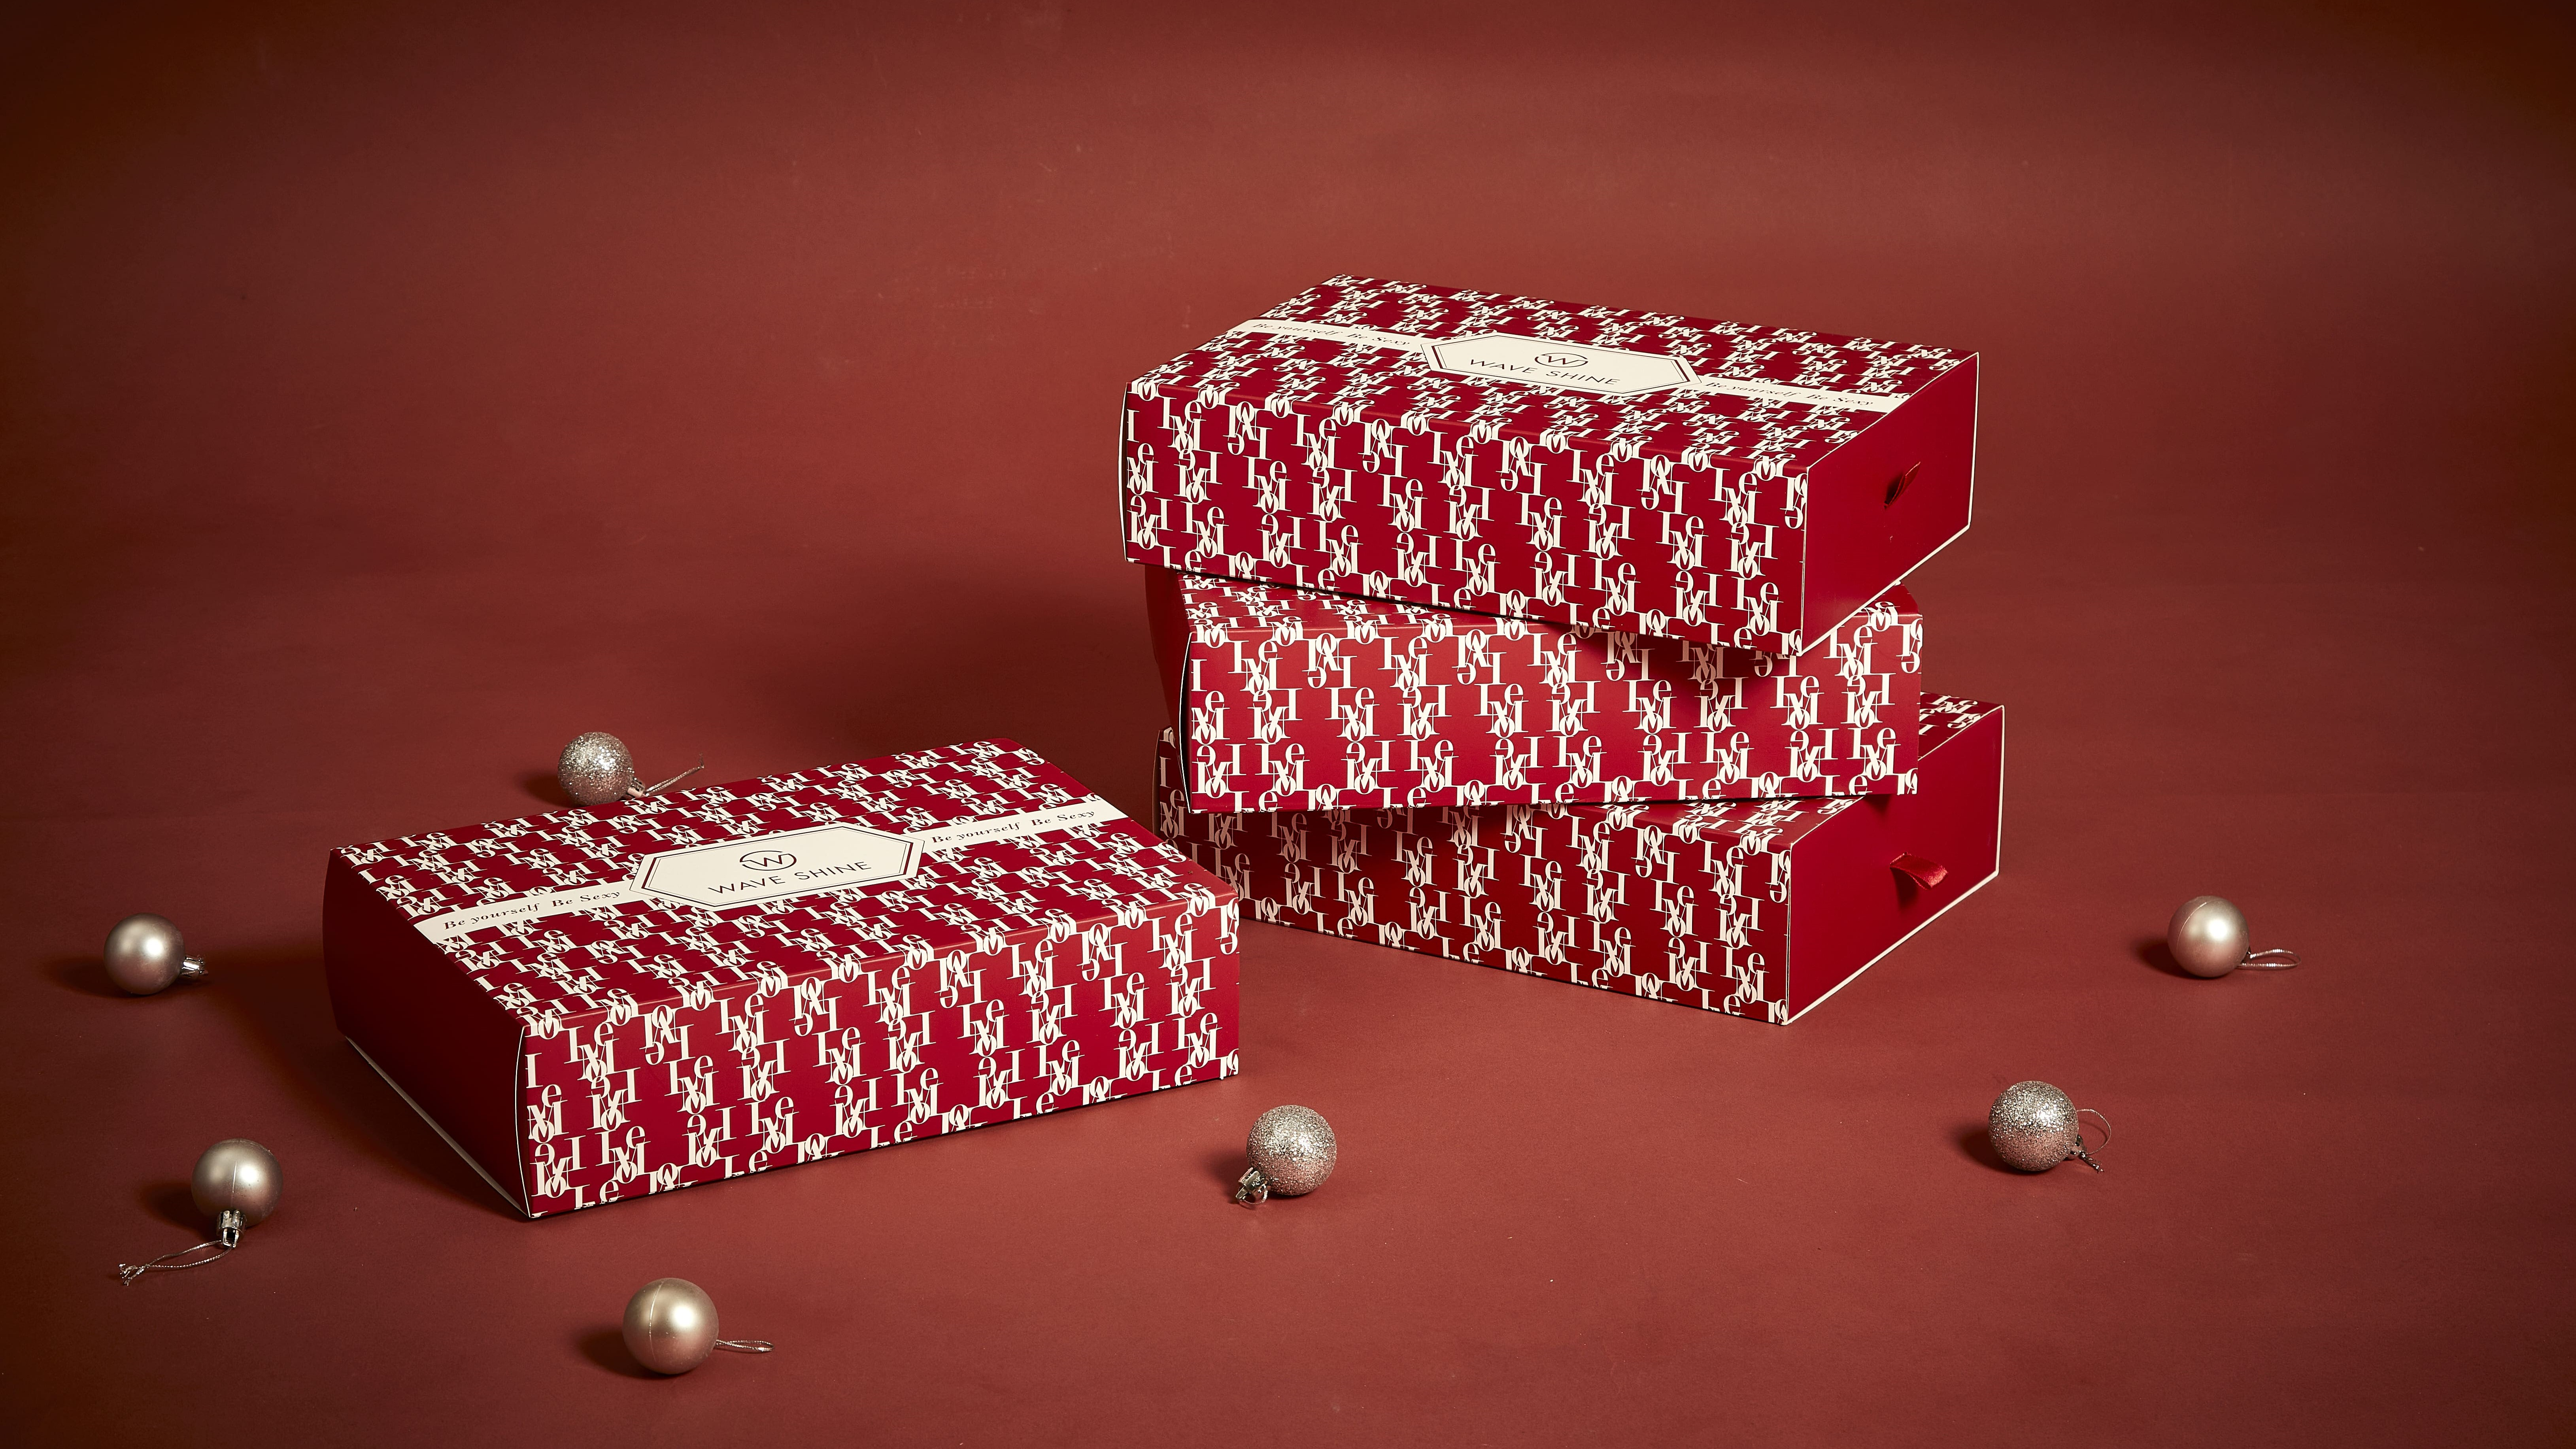 WAVE SHINE 泳裝「最辣聖誕禮盒」媒體推廣